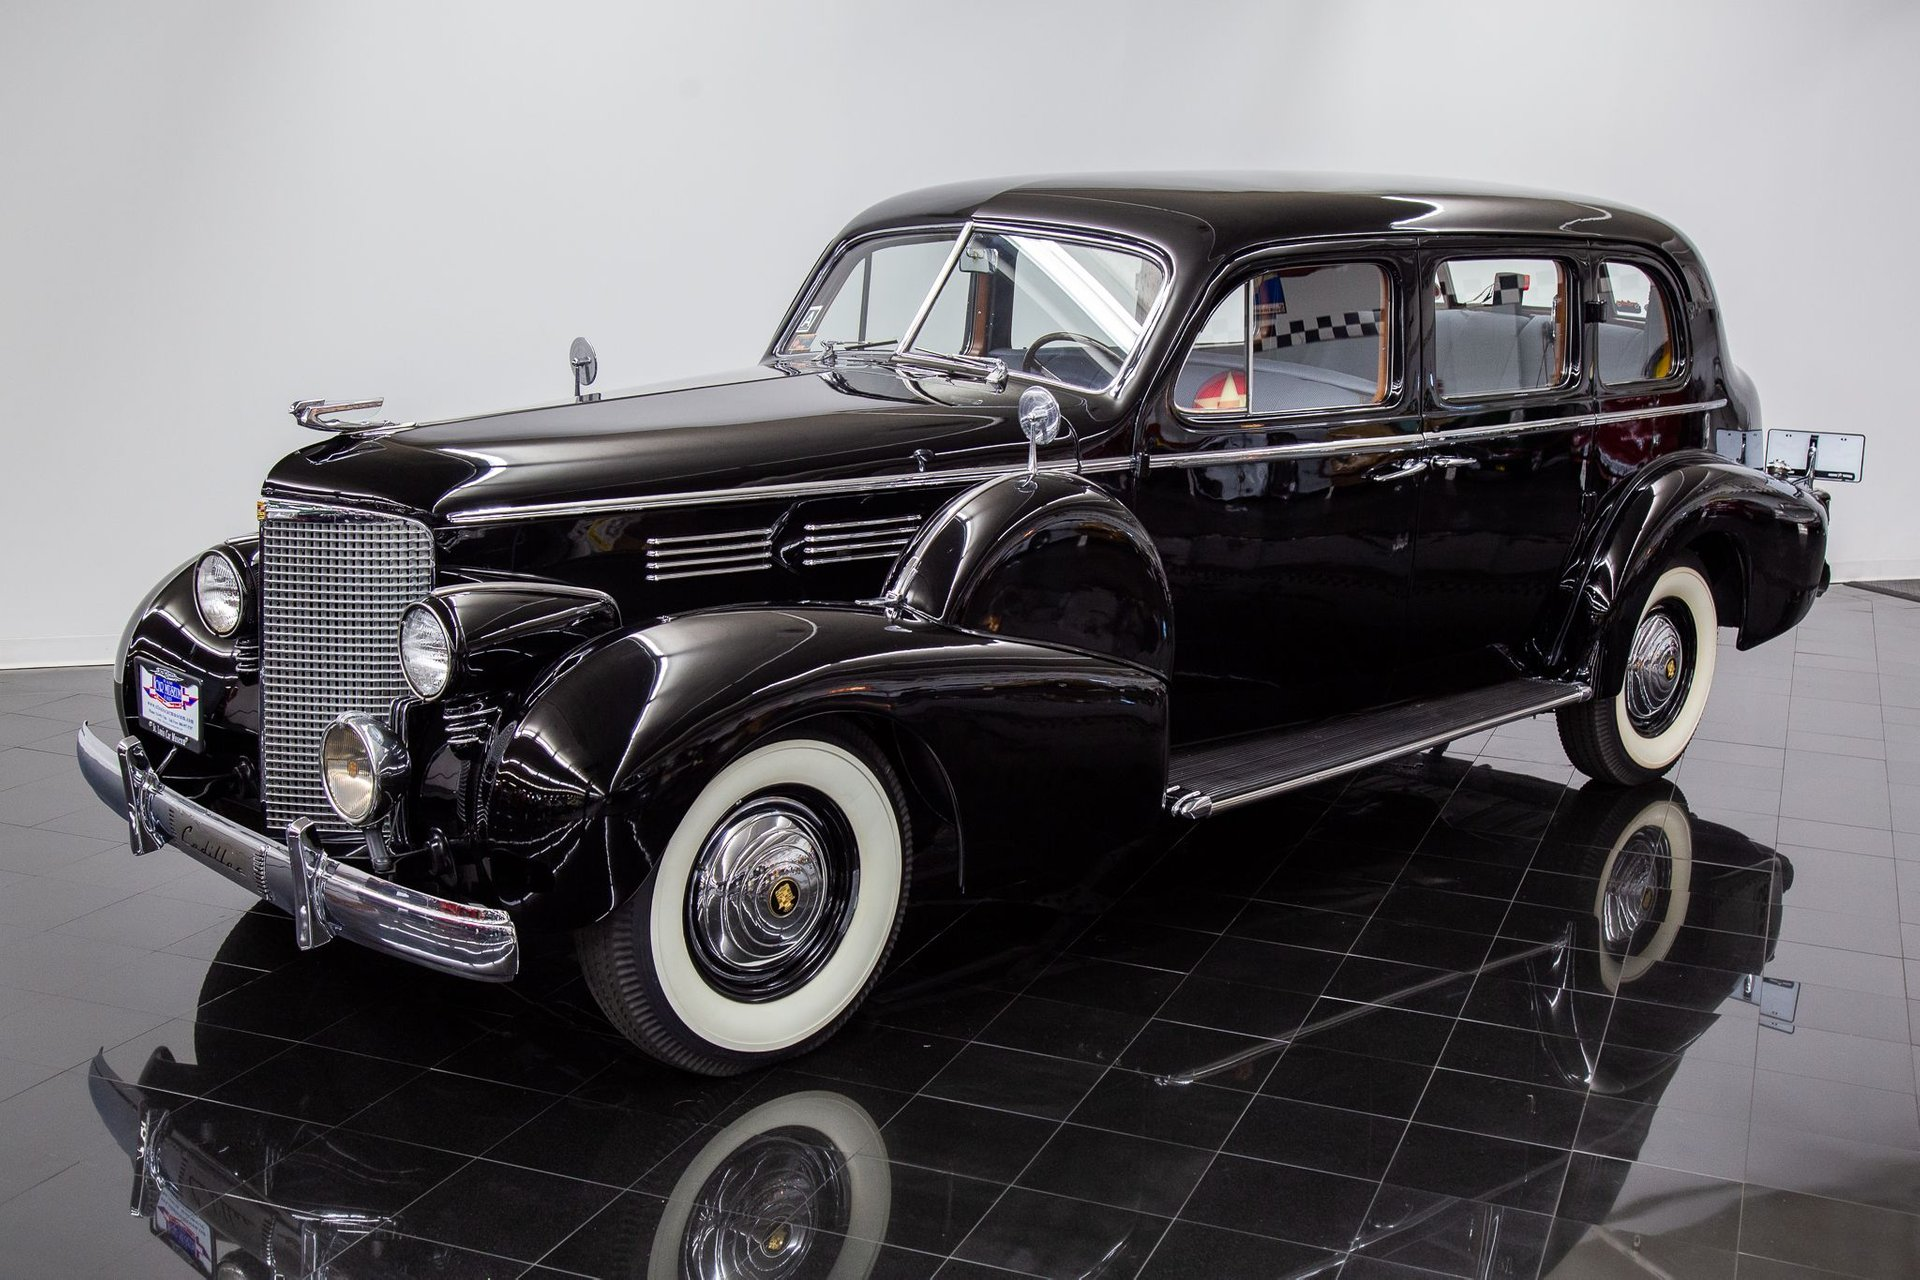 1938 cadillac fleetwood 75 touring sedan